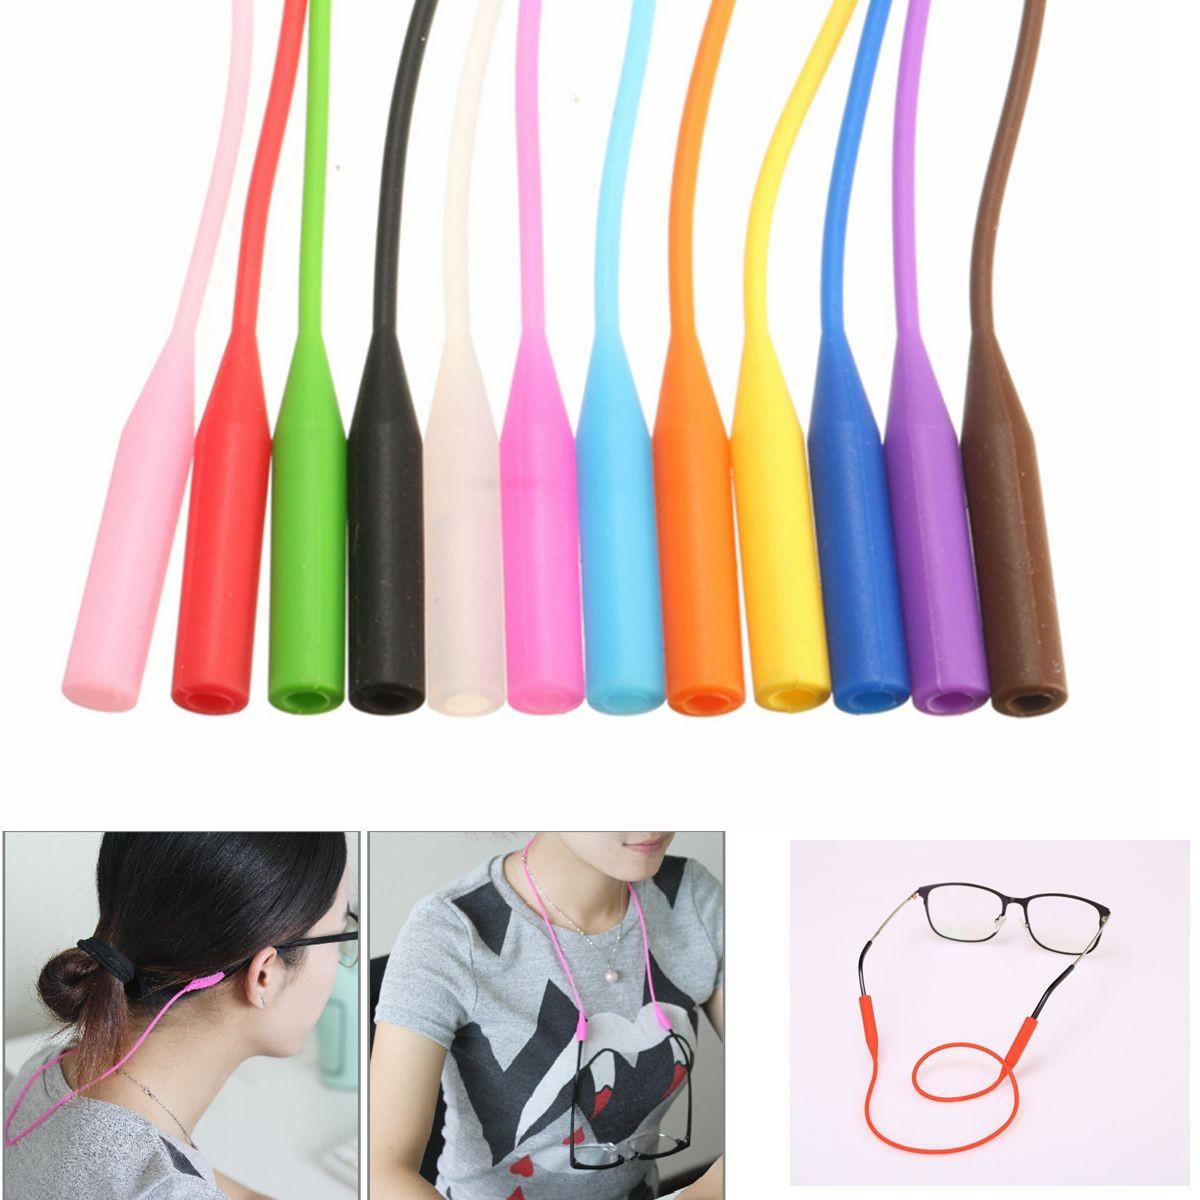 Buy 53cm Adjustable Glasses Strap Neck Cord Sports Eye glasses Band Sunglasses Rope Strin